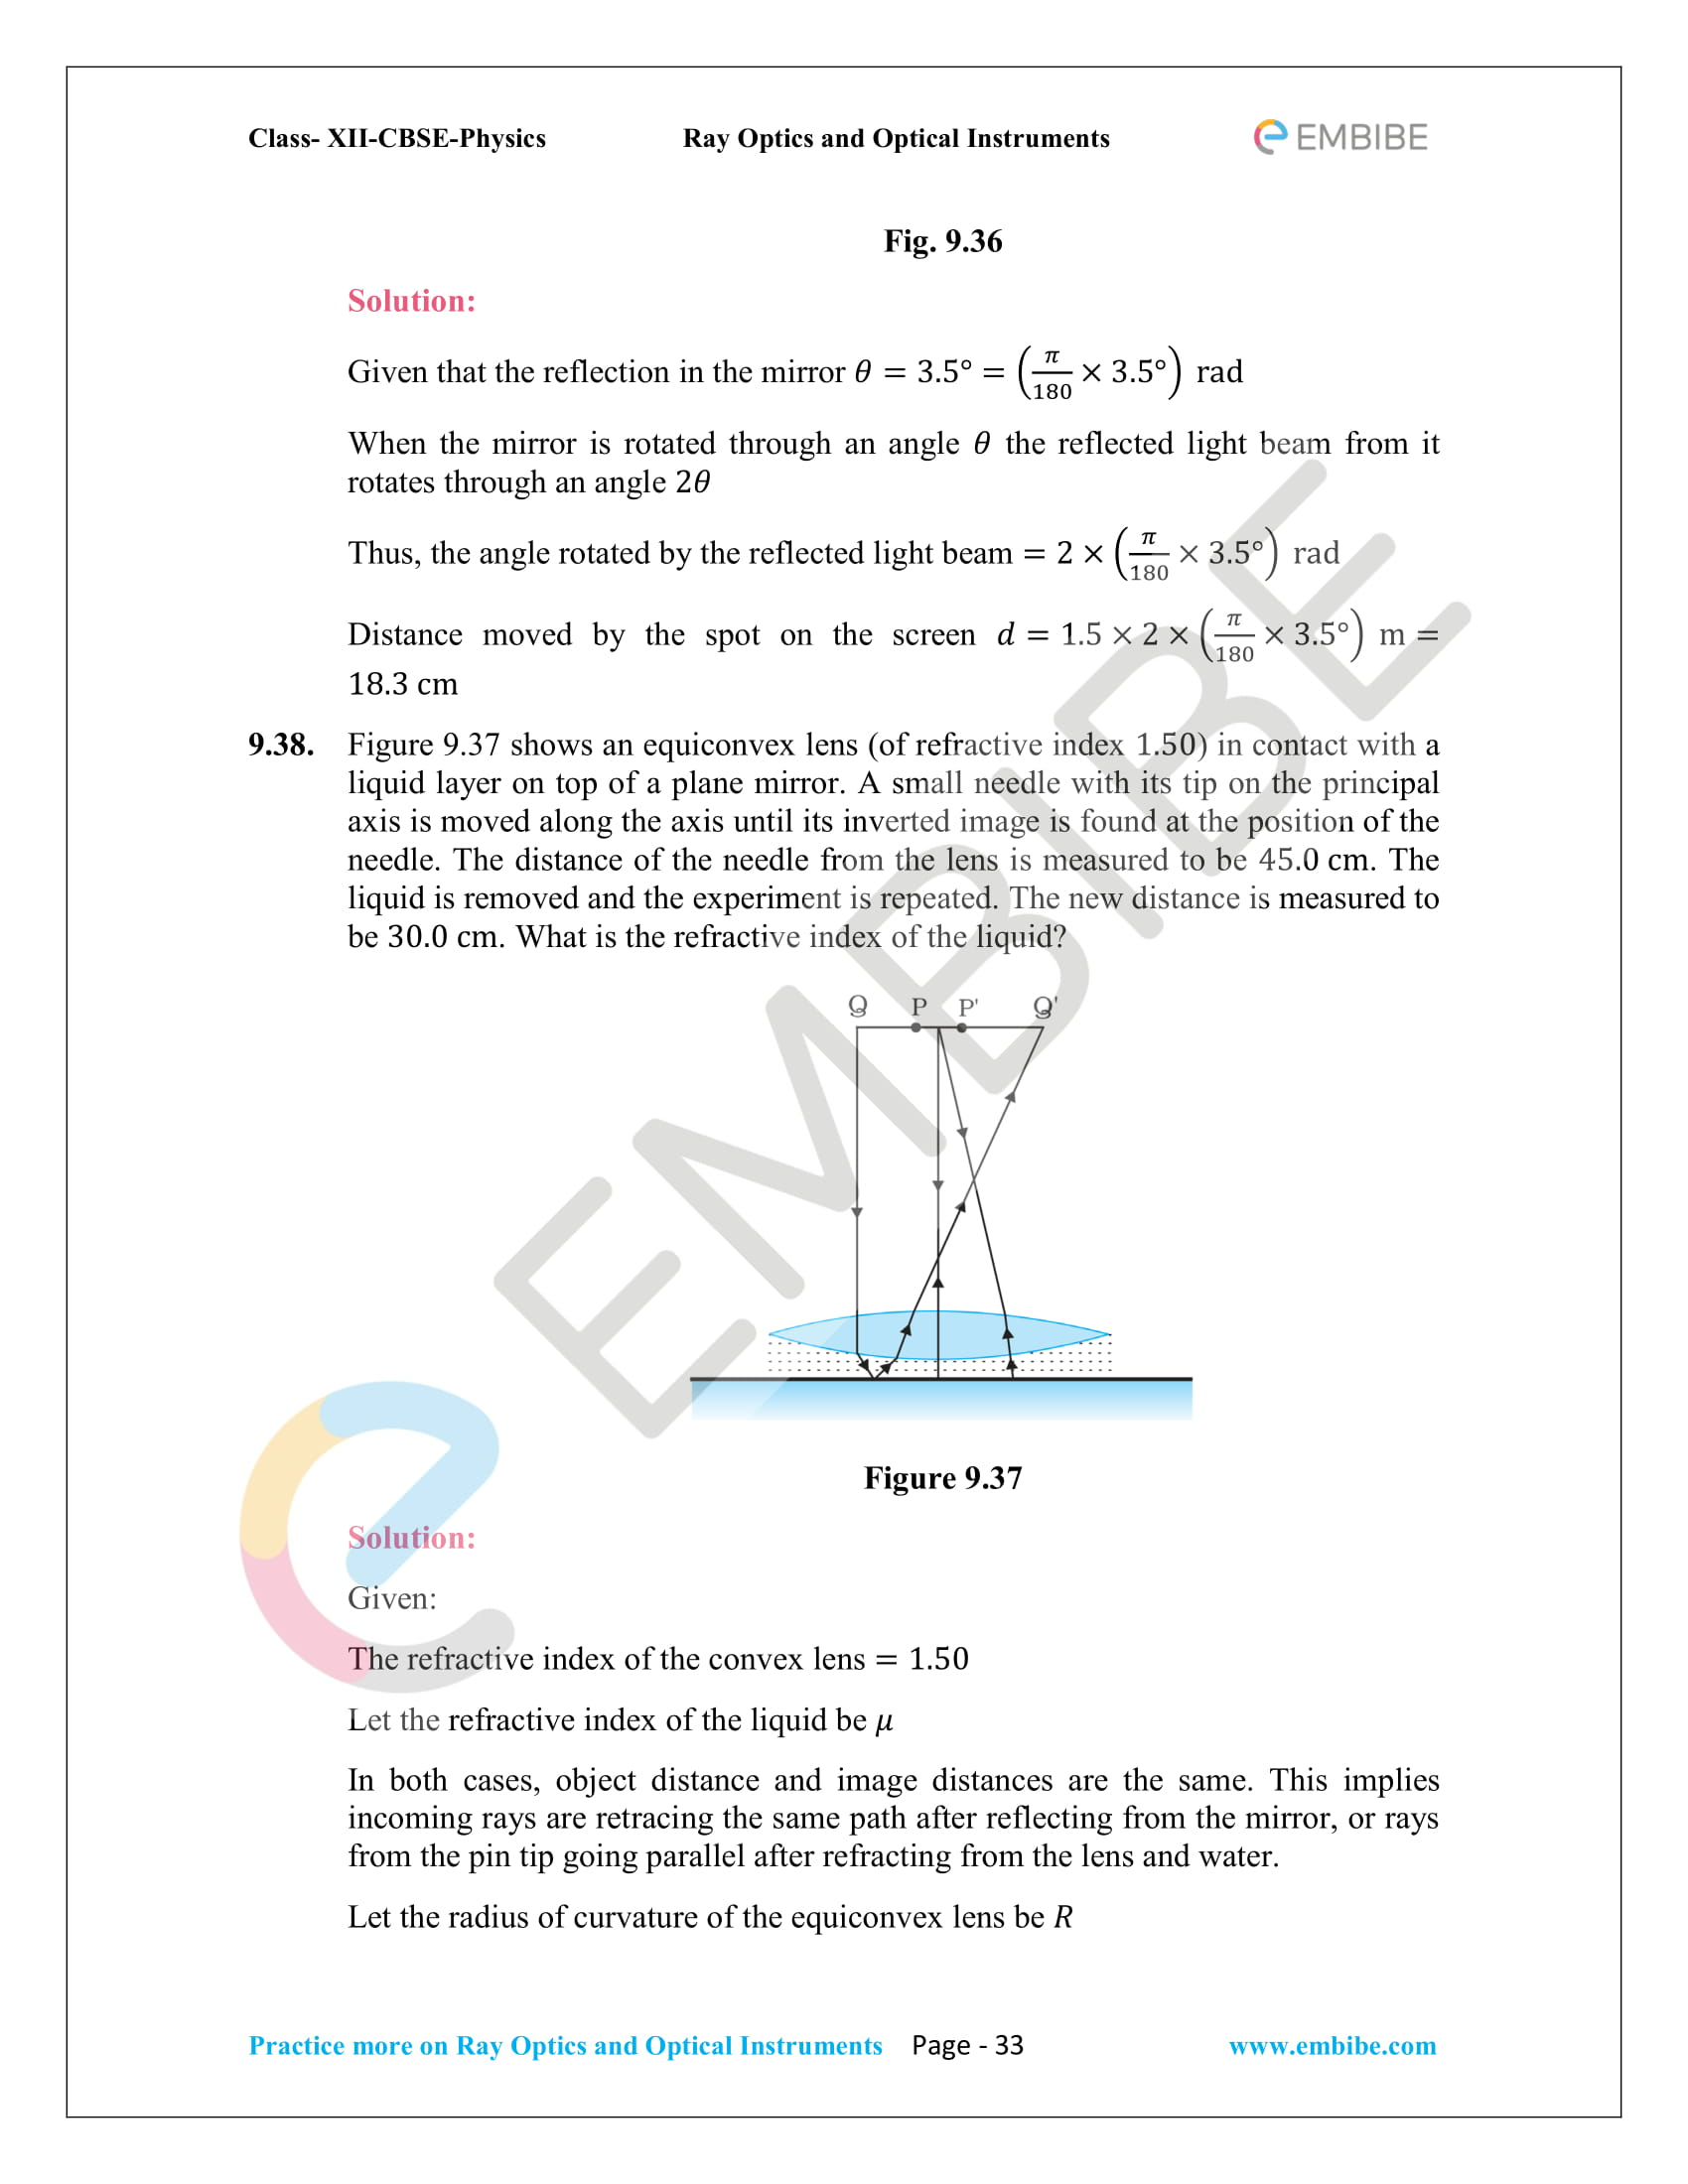 NCERT_Grade 12_Physics_Ch_09_Ray Optics-33